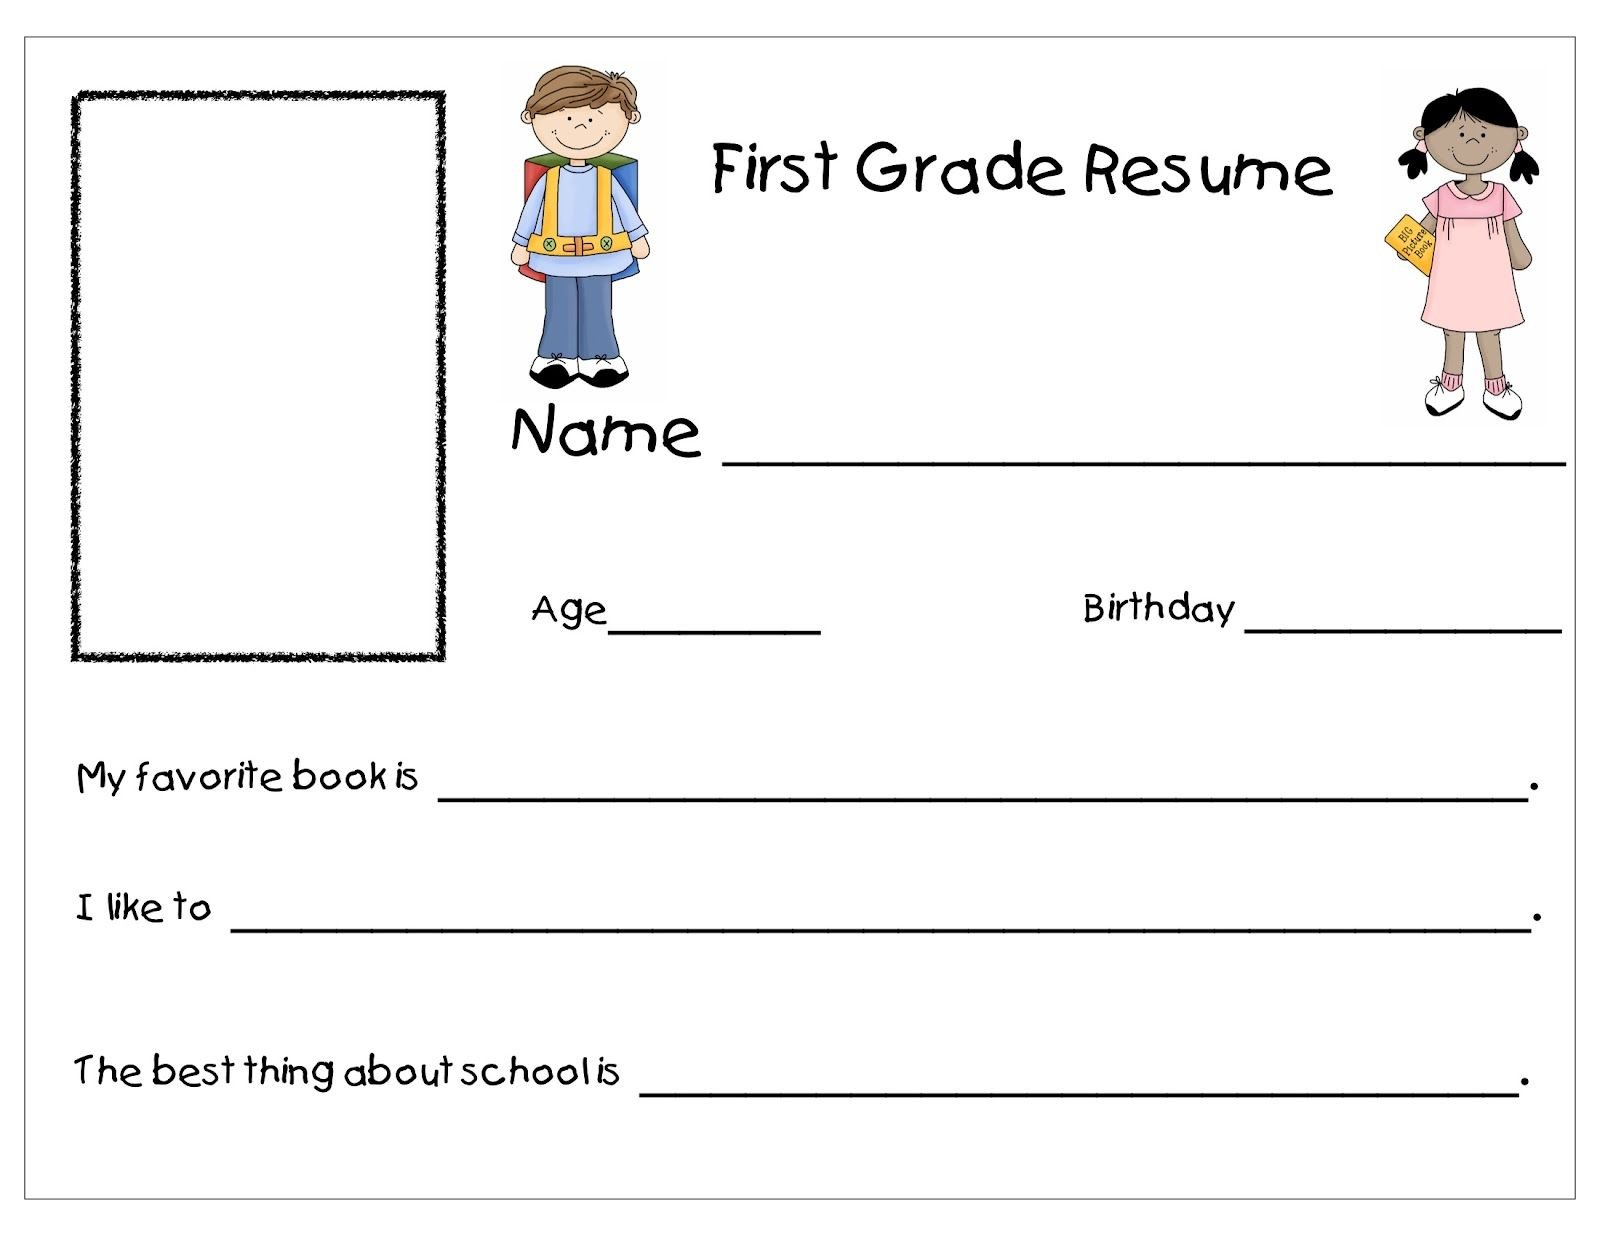 First Grade Resume